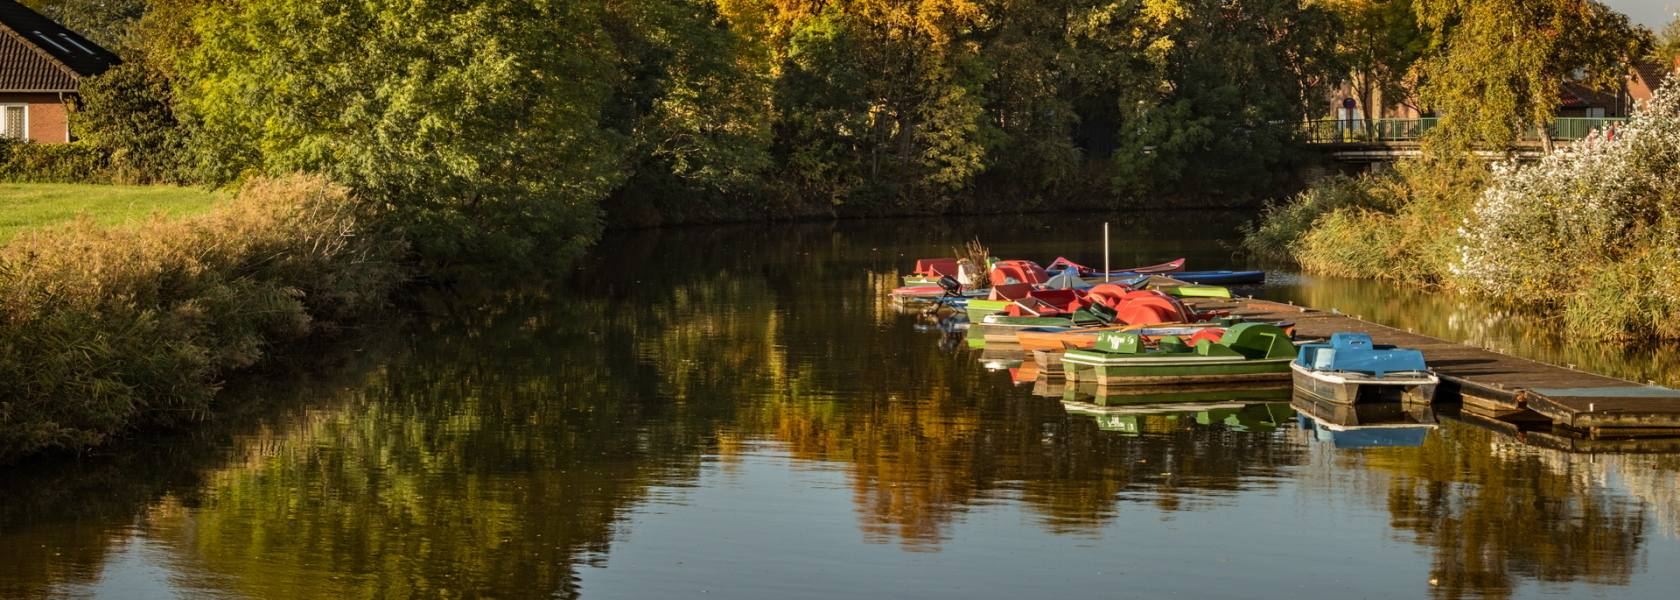 Kanal in Greetsiel, © Andrea Ullius, ullala.ch